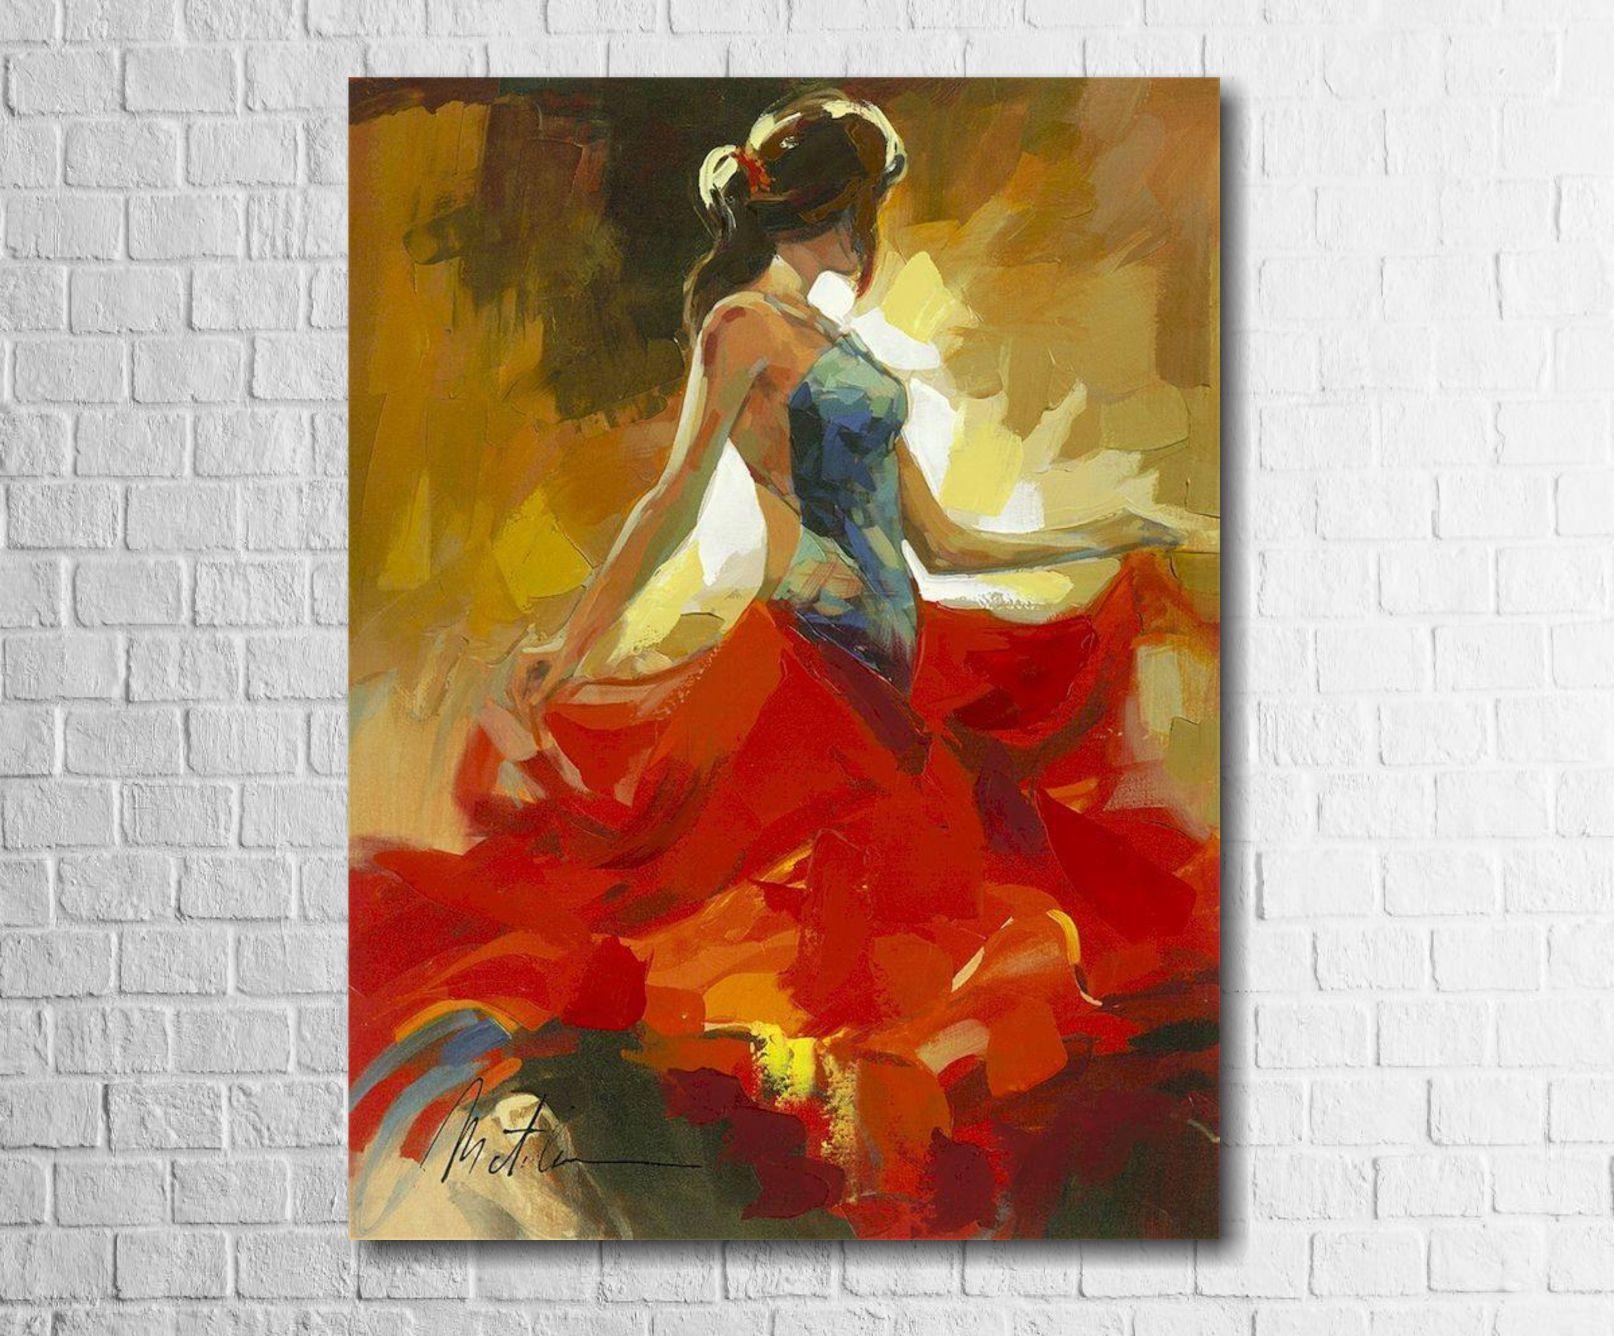 Quadro Decorativo Estilo Pintura Dançarina 1 peça